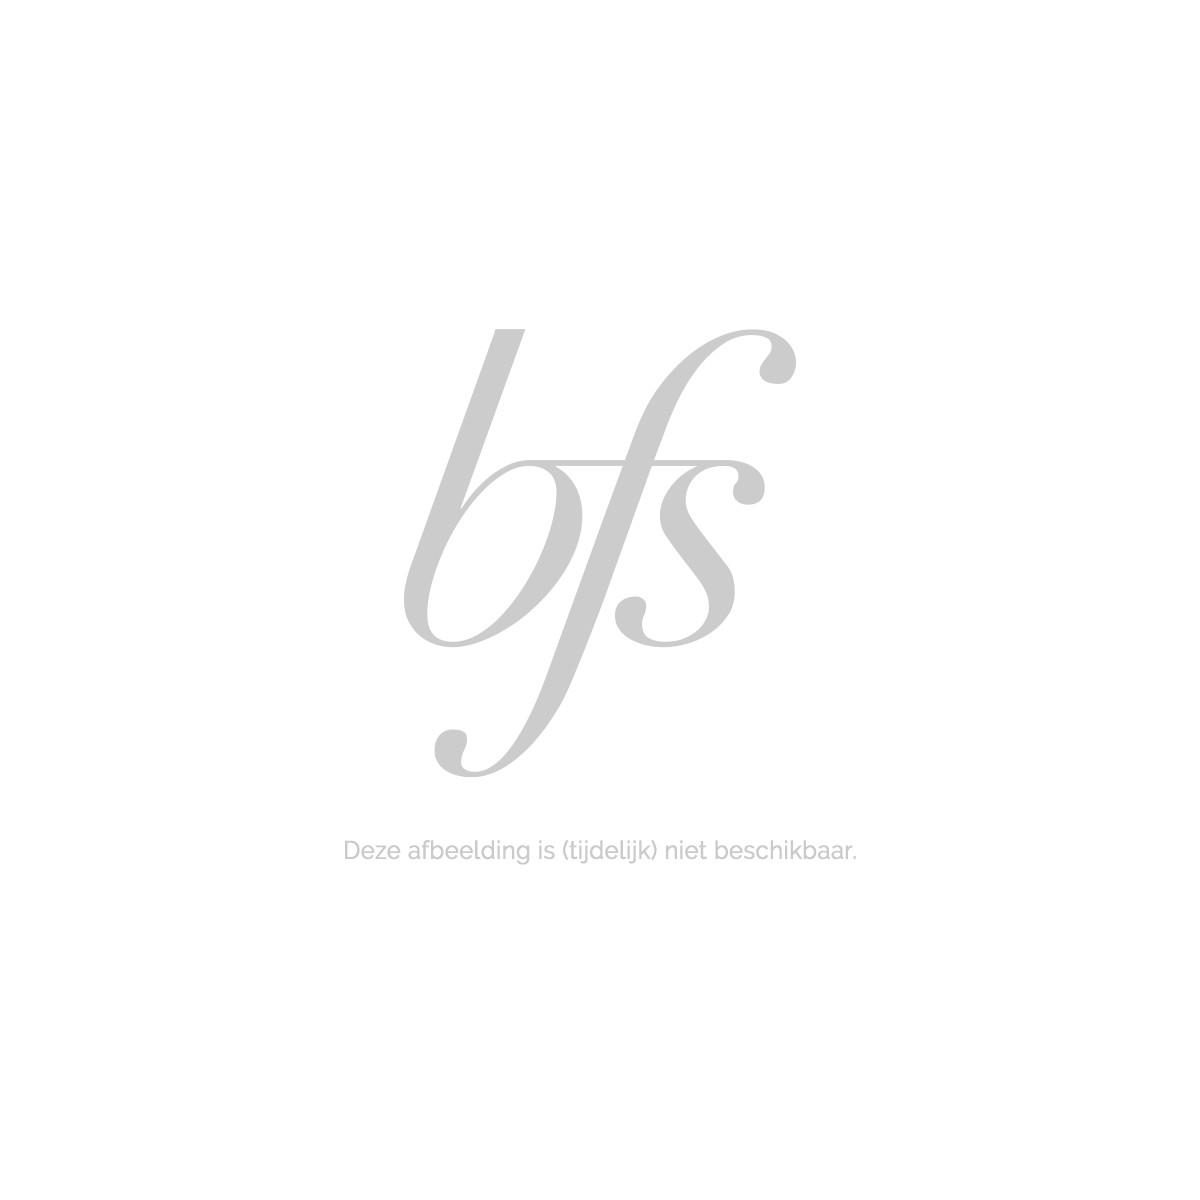 Sensai Luminous Sheer Foundation Spf15 #102 Ivory Beige 30 Ml